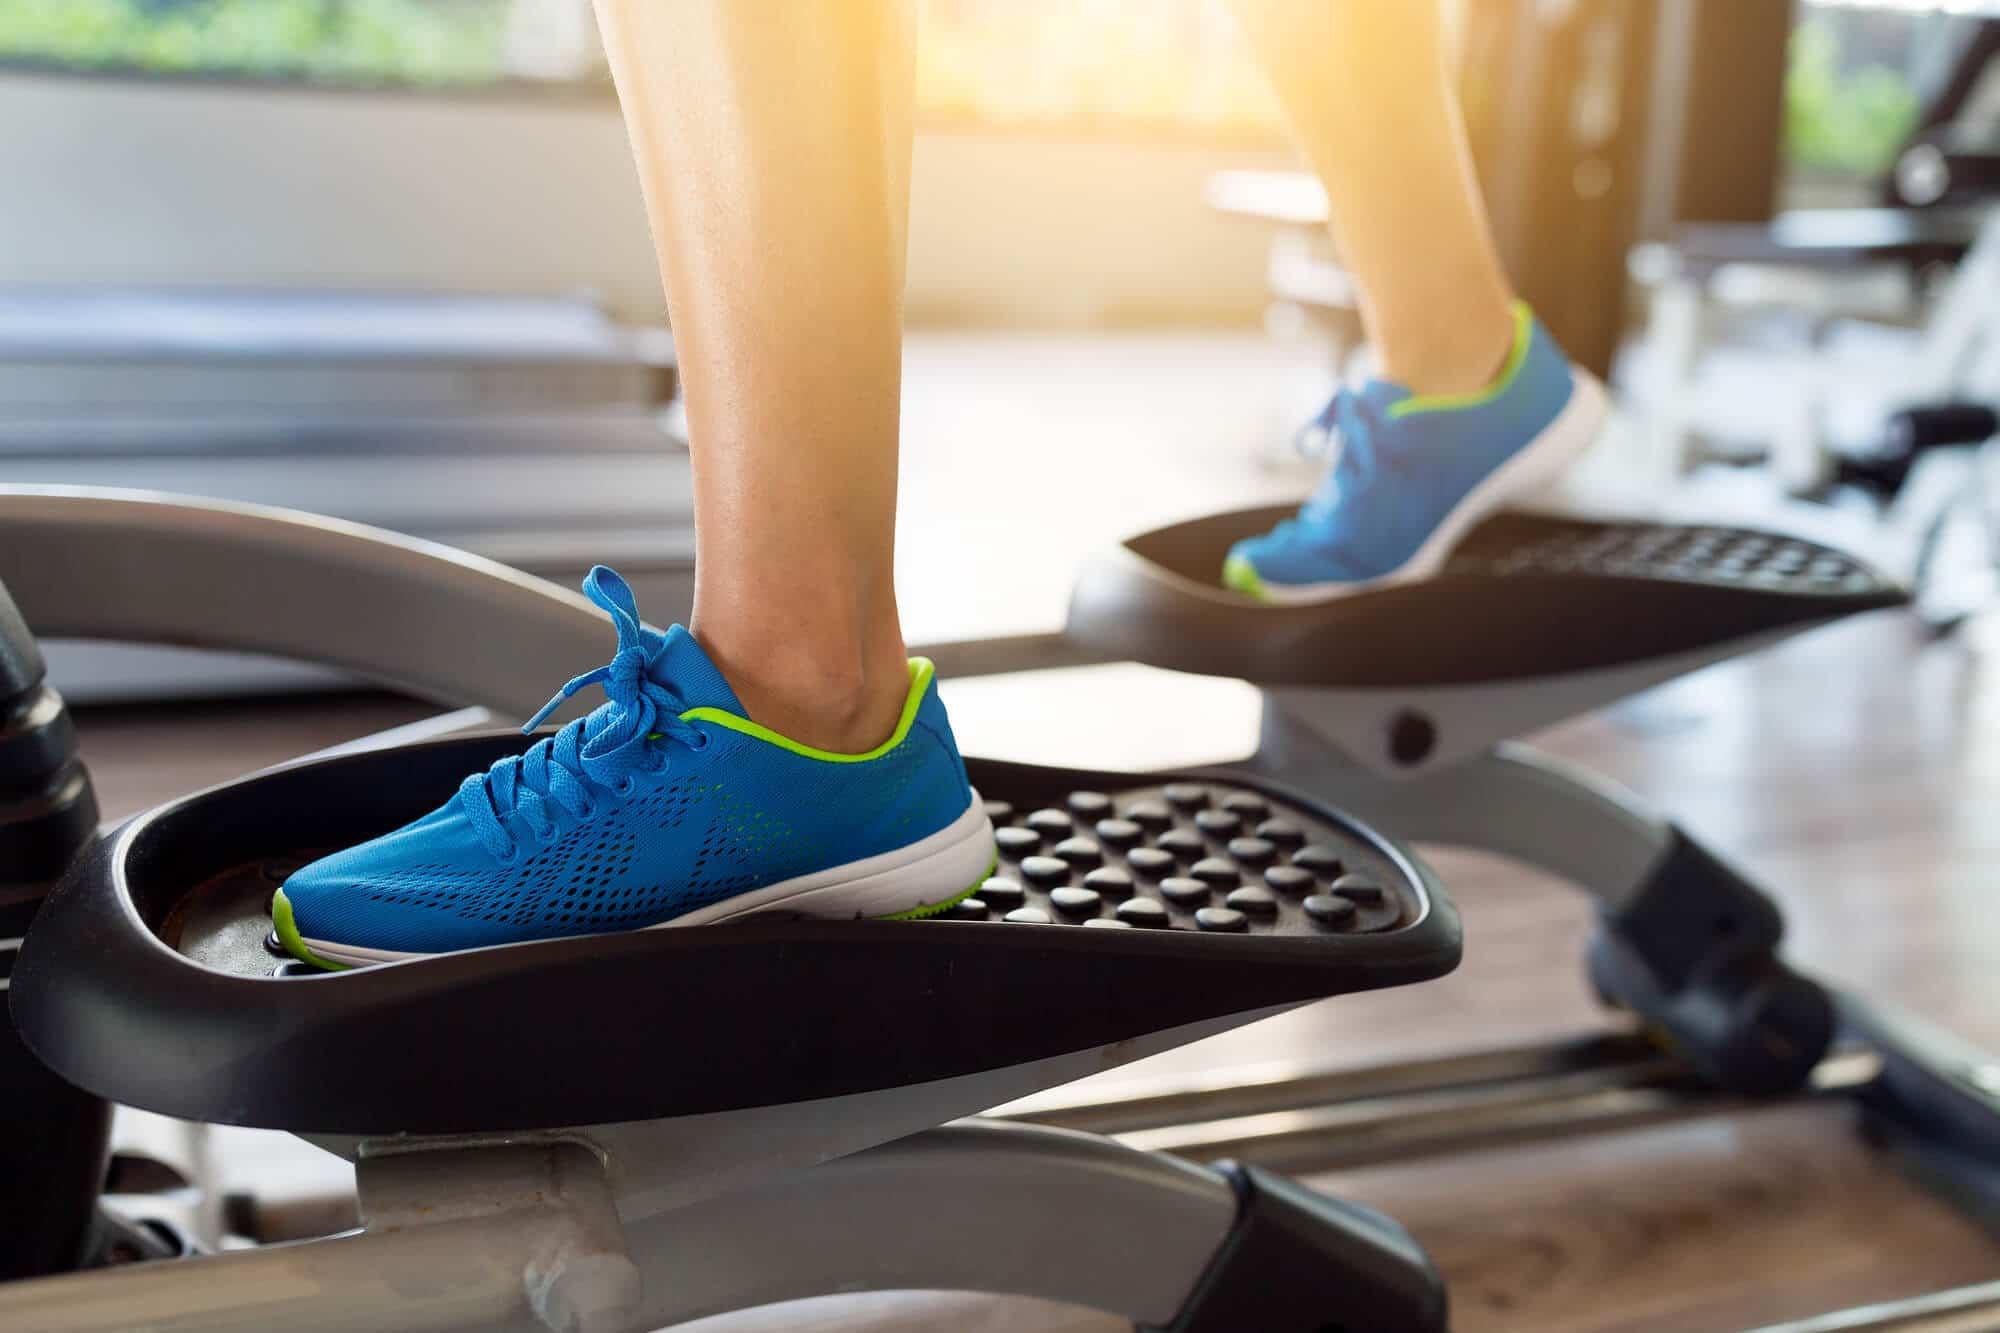 elliptical good for knees - Fitness Expo